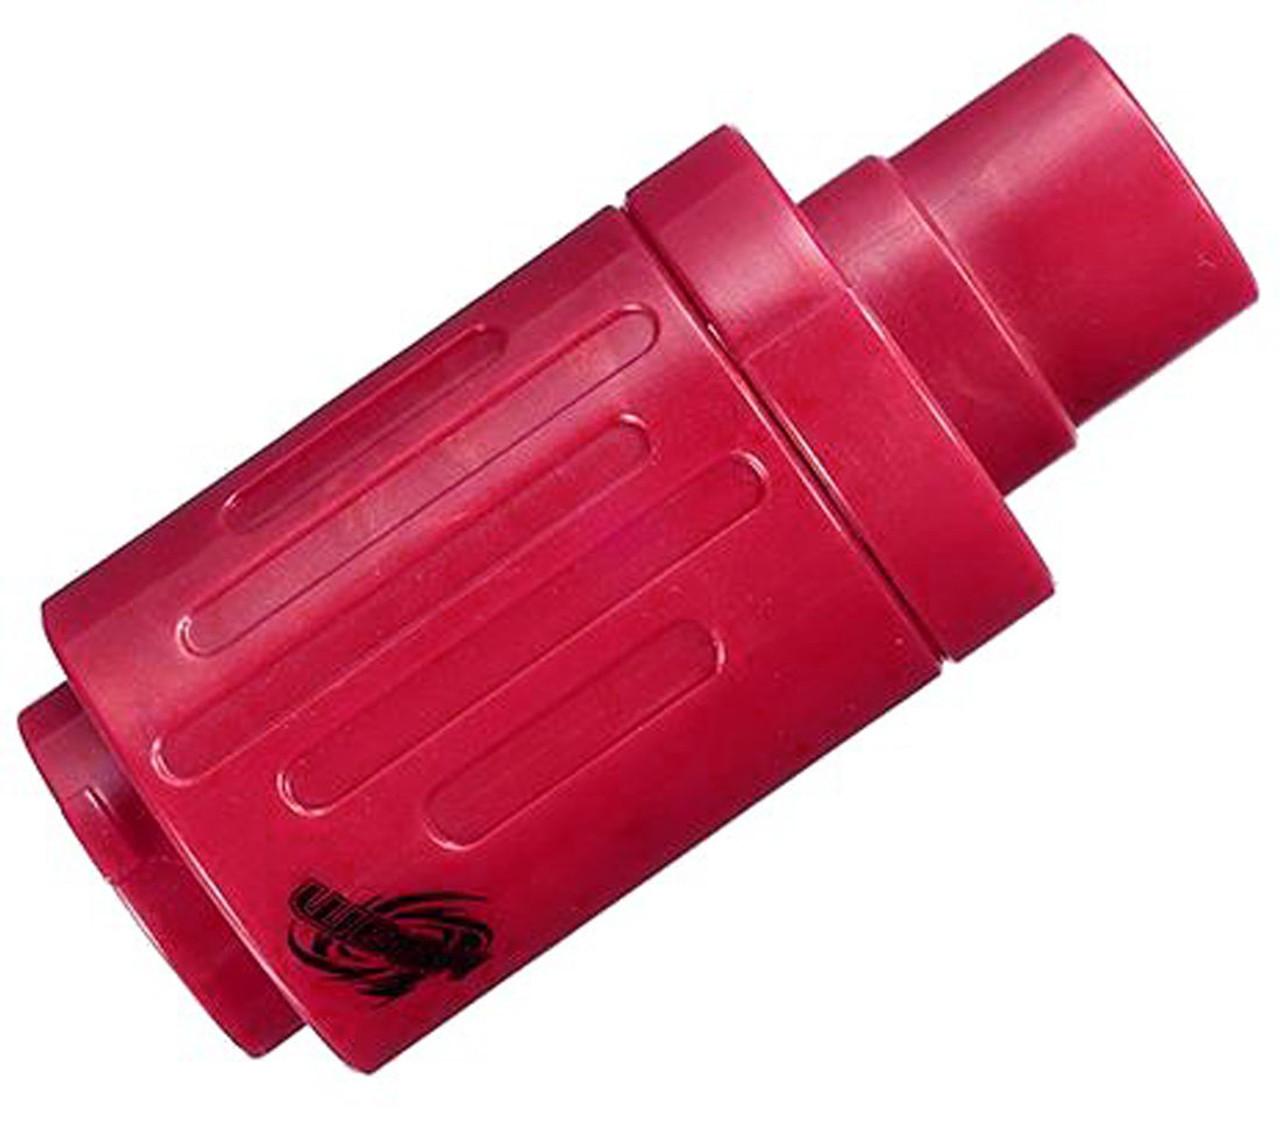 Hot Wheels LEXMARK White Passion w//red /& purple graphics item #22078 mfg 1998